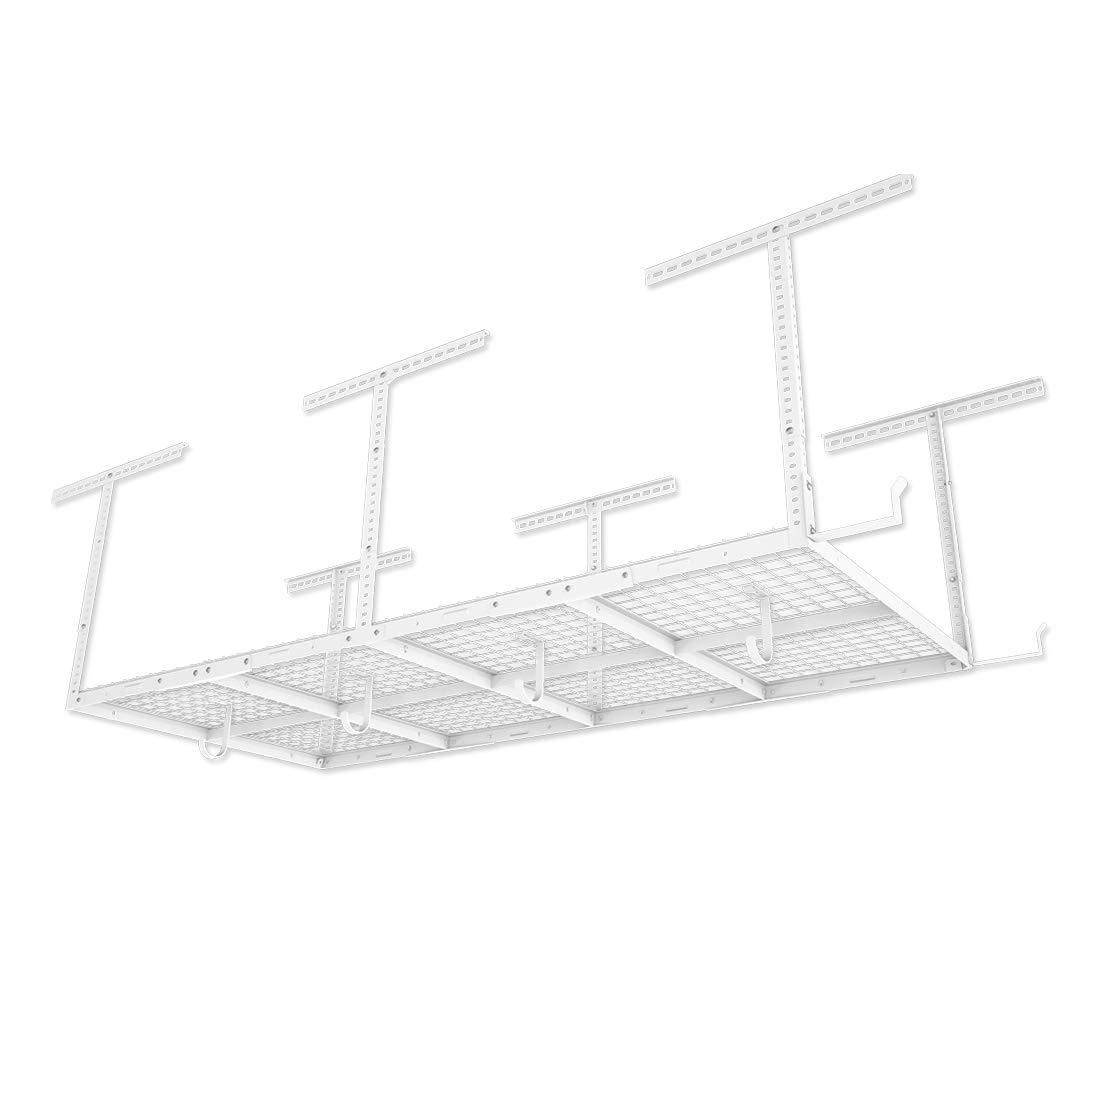 FLEXIMOUNTS 4x8 Overhead Garage Storage Rack w/Hooks Adjustable Ceiling Storage Racks, 96'' Length x 48'' Width x 40'' Height, 22''-40'' Ceiling Dropdown, White by FLEXIMOUNTS